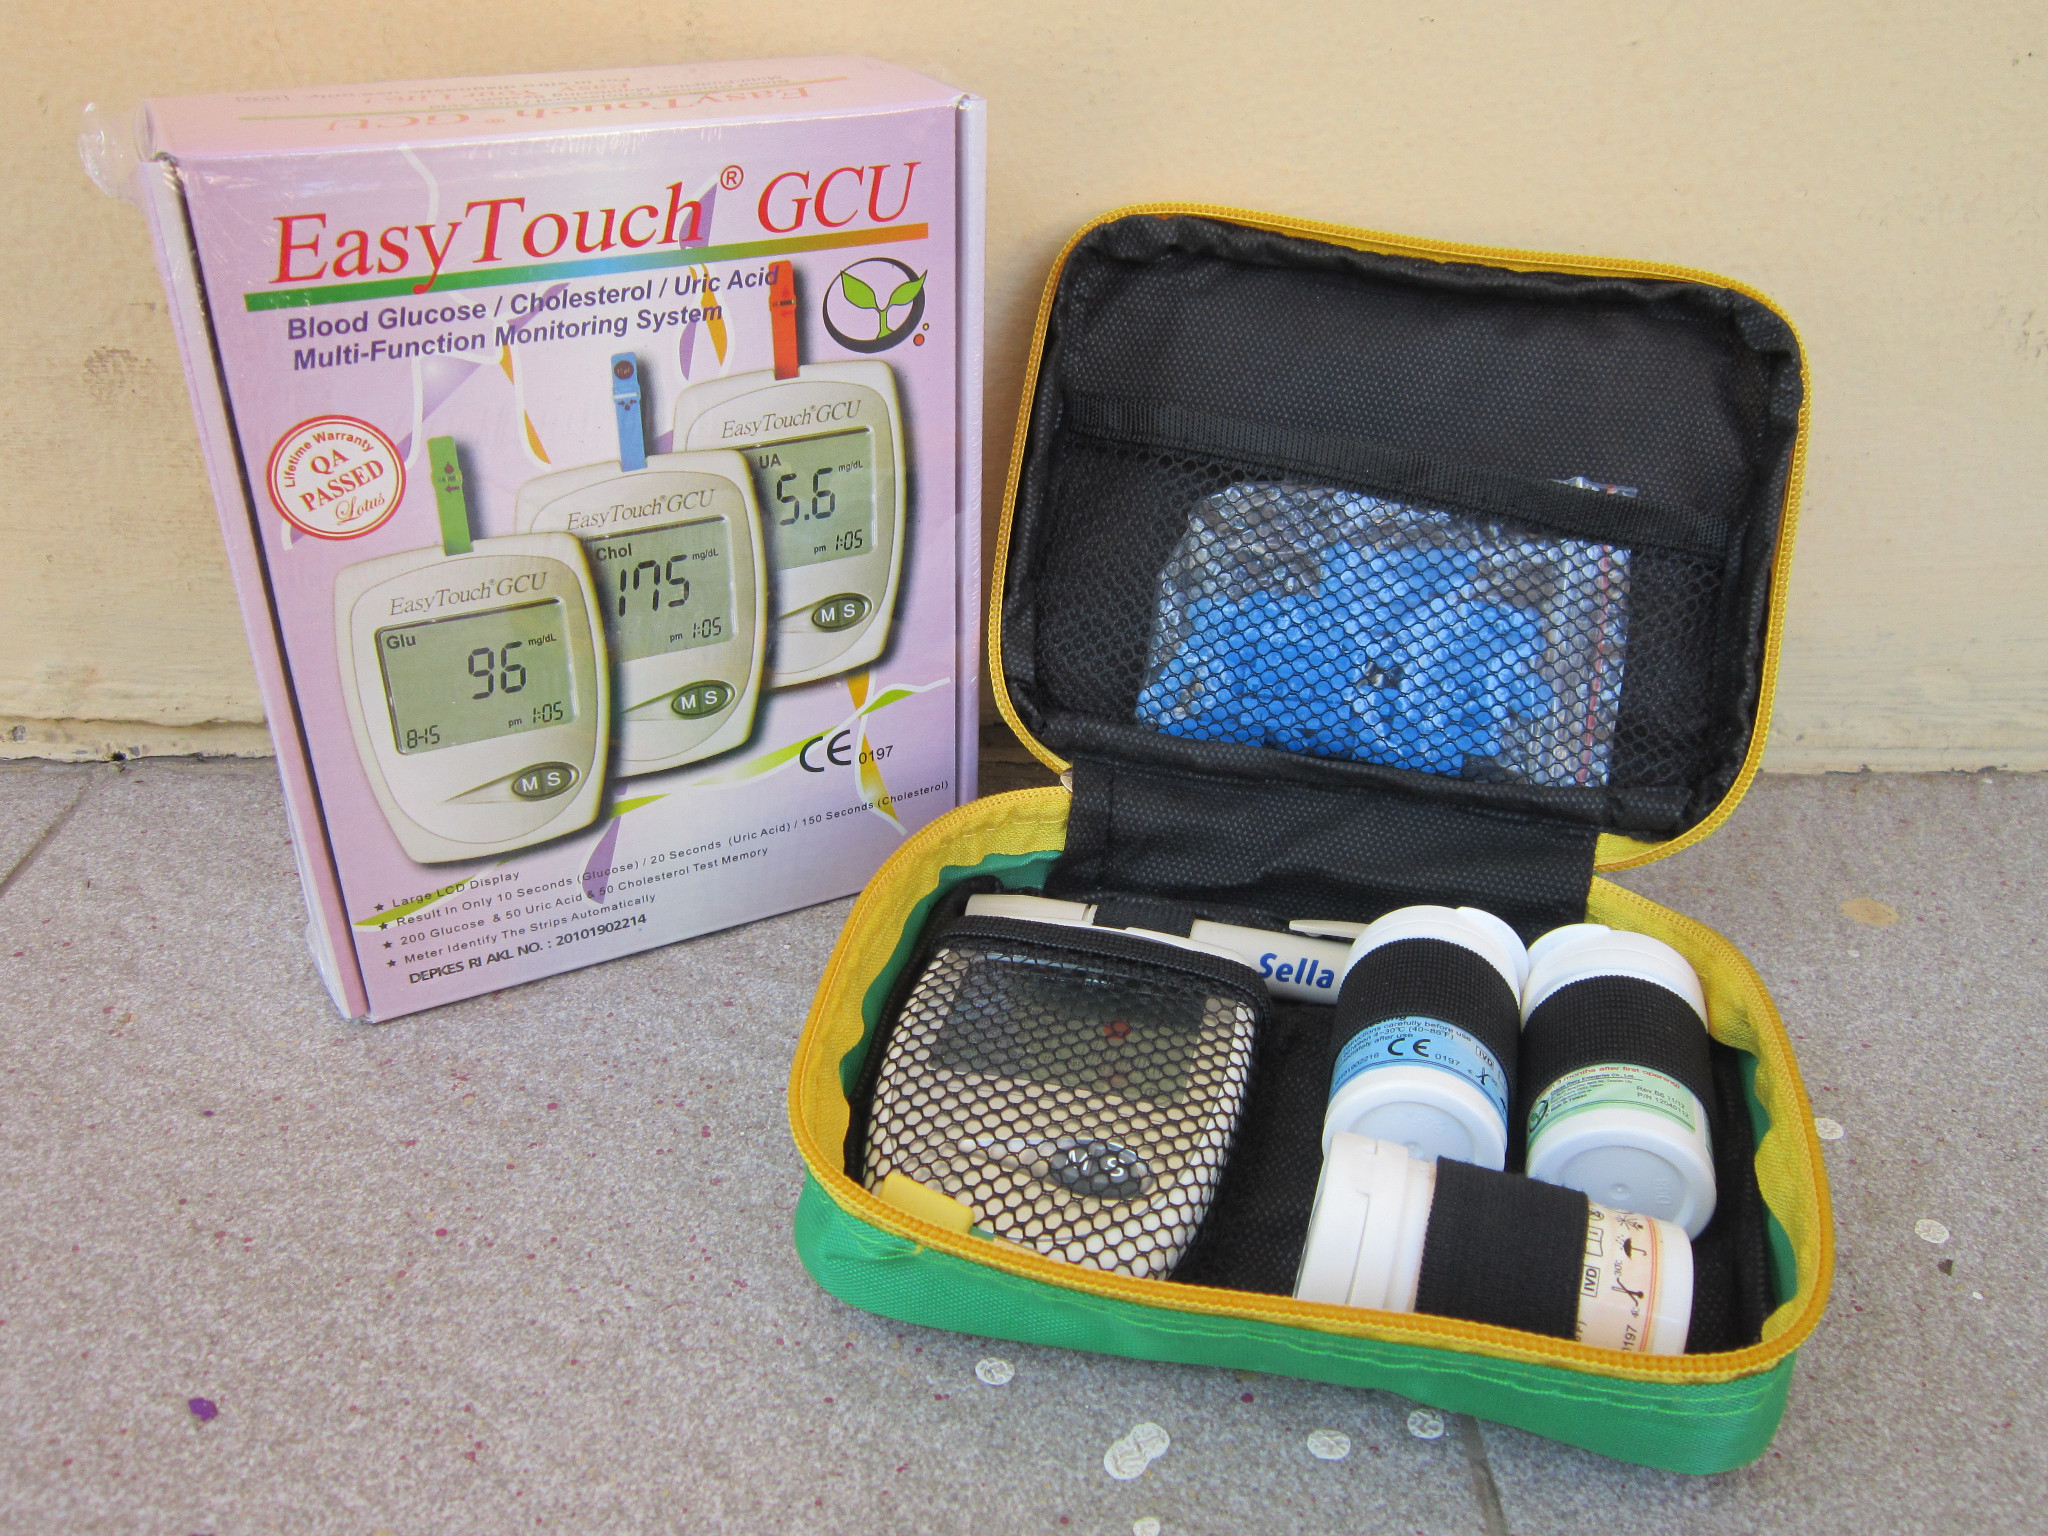 Easy Touch Gcu Blood Glucose Cholesterol Uric Acid Meter Too Much Test Gula Asam Urat 3in1 Can U Get Gout In Toes